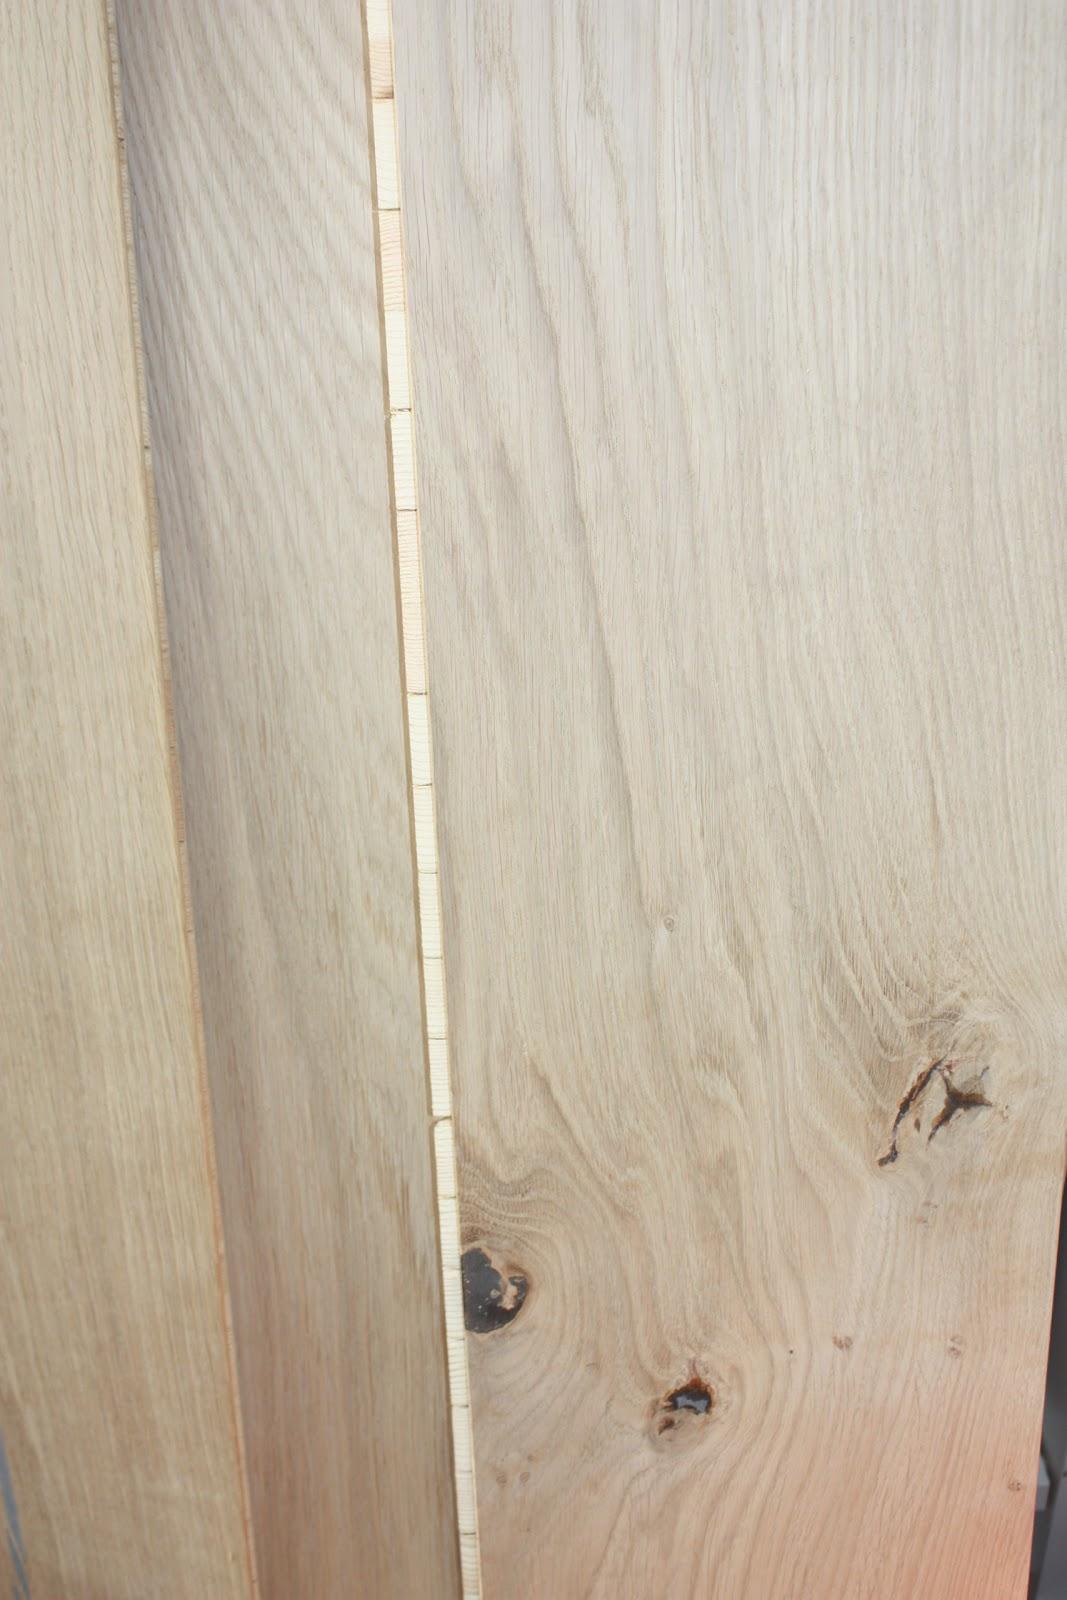 Ekgolv Plank. Stunning Explore Planks And More With Ekgolv Plank ... : dala floda golv : Inredning